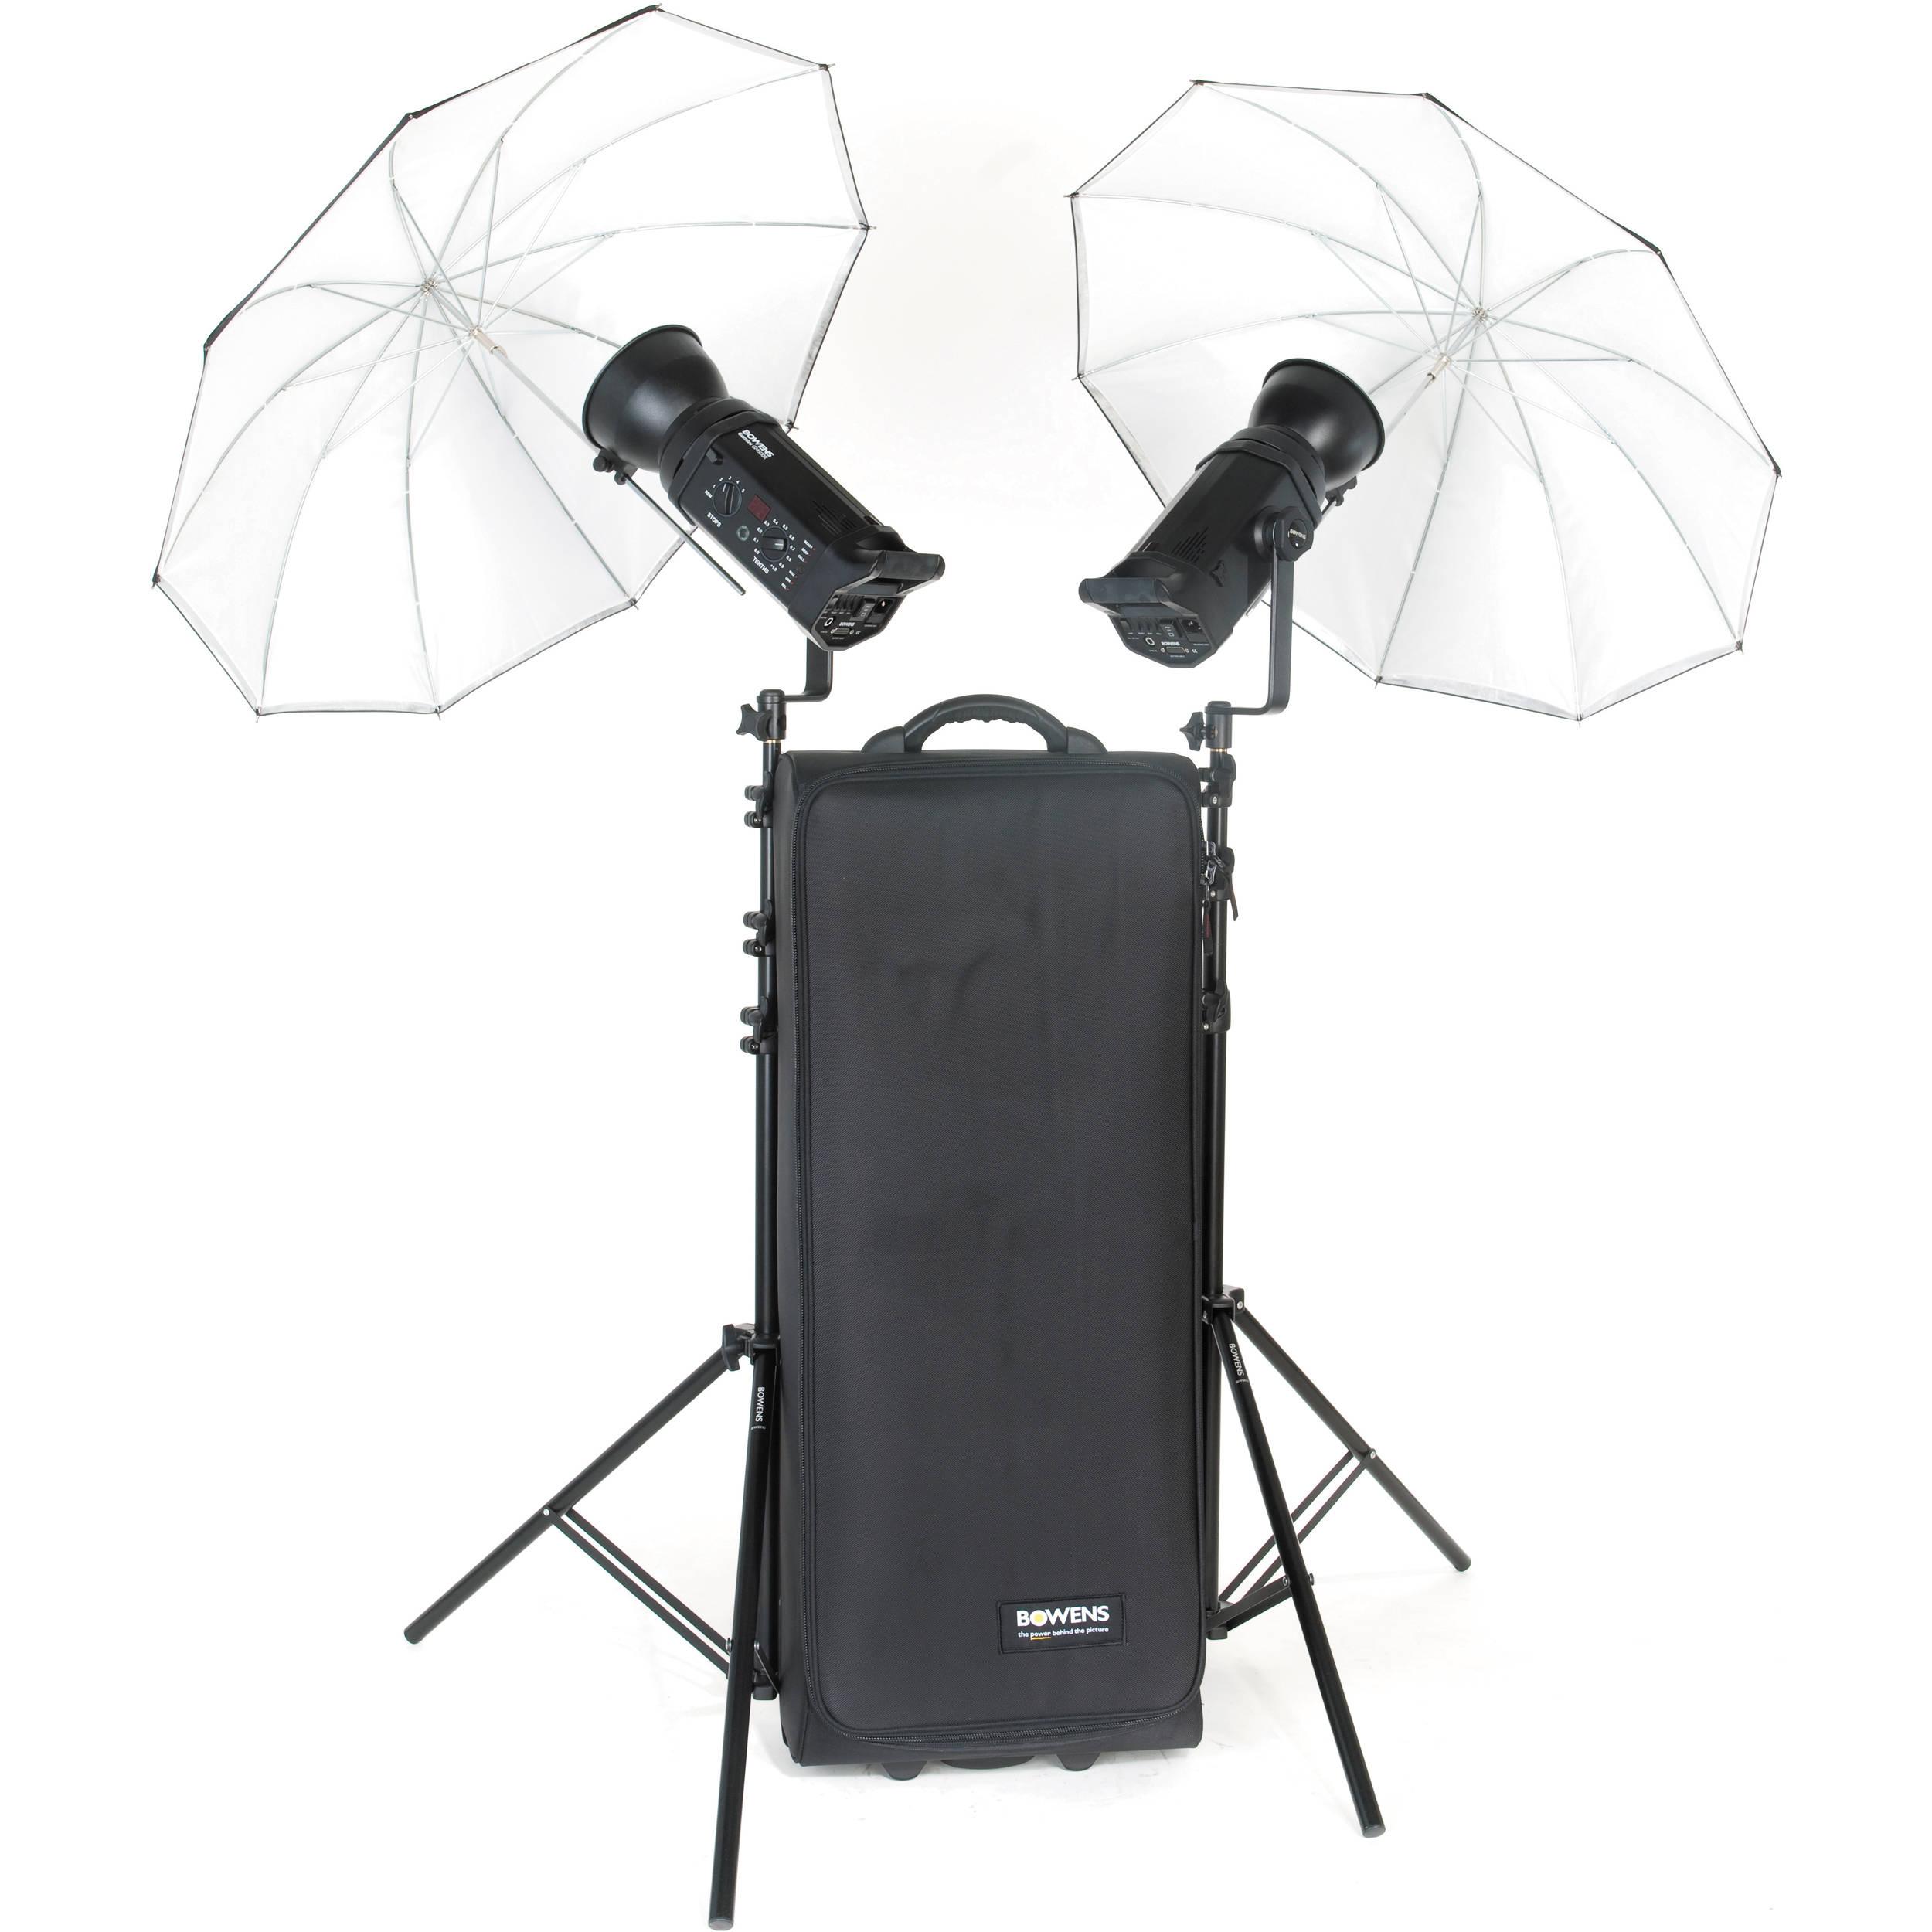 Bowens Esprit 500 Studio Lighting Kit: Bowens Gemini 500R PW 2-Light Kit BW-4805USDAP B&H Photo Video